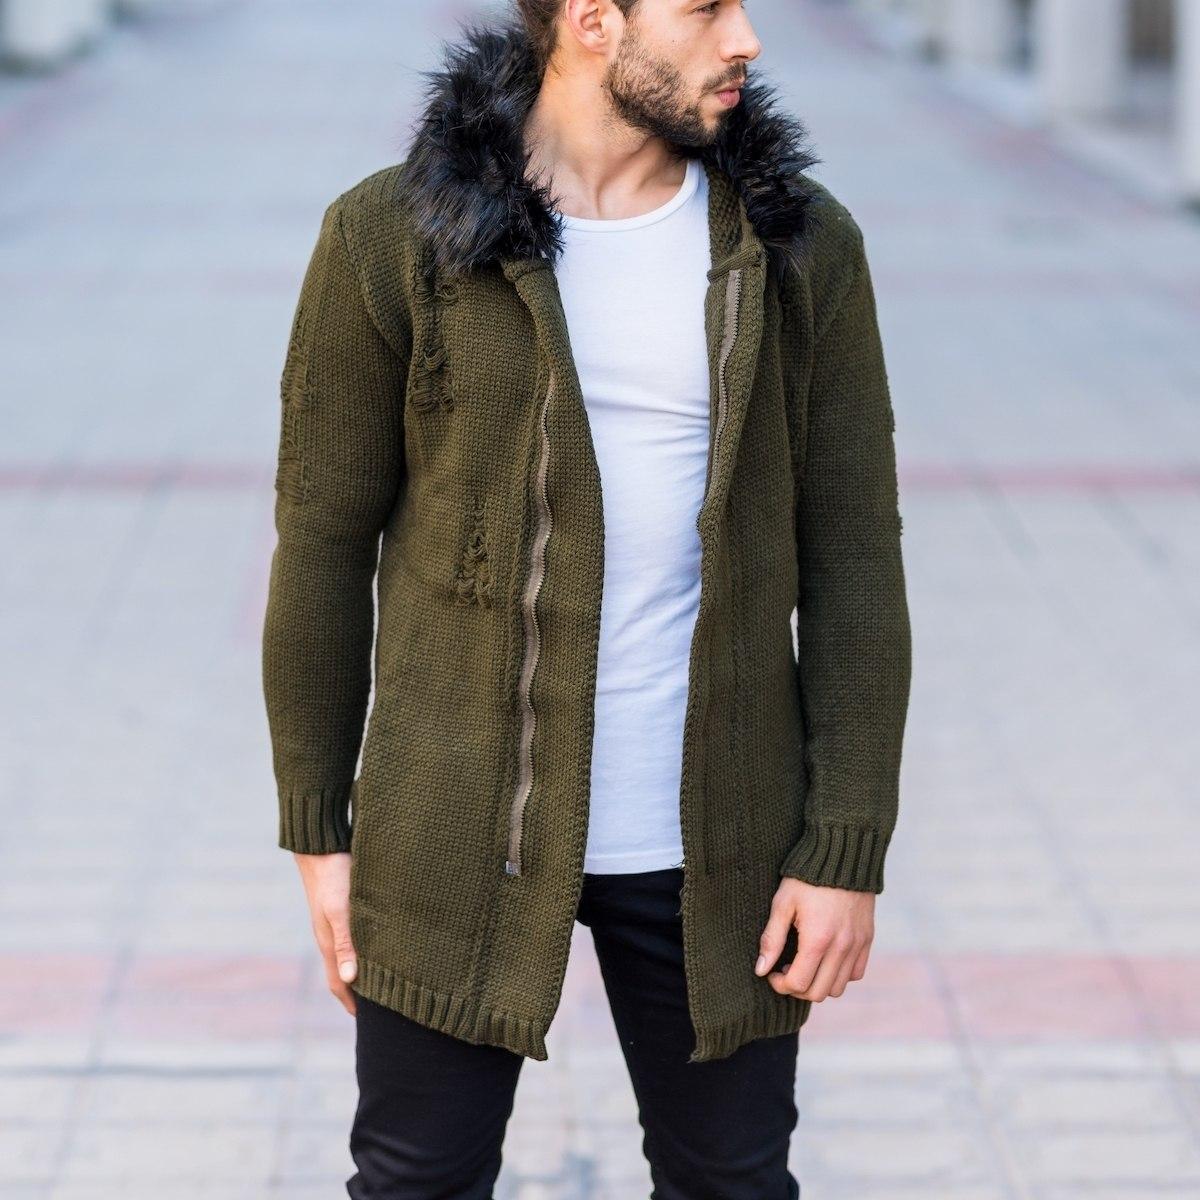 Men's Furry Hooded Cardigan In Khaki